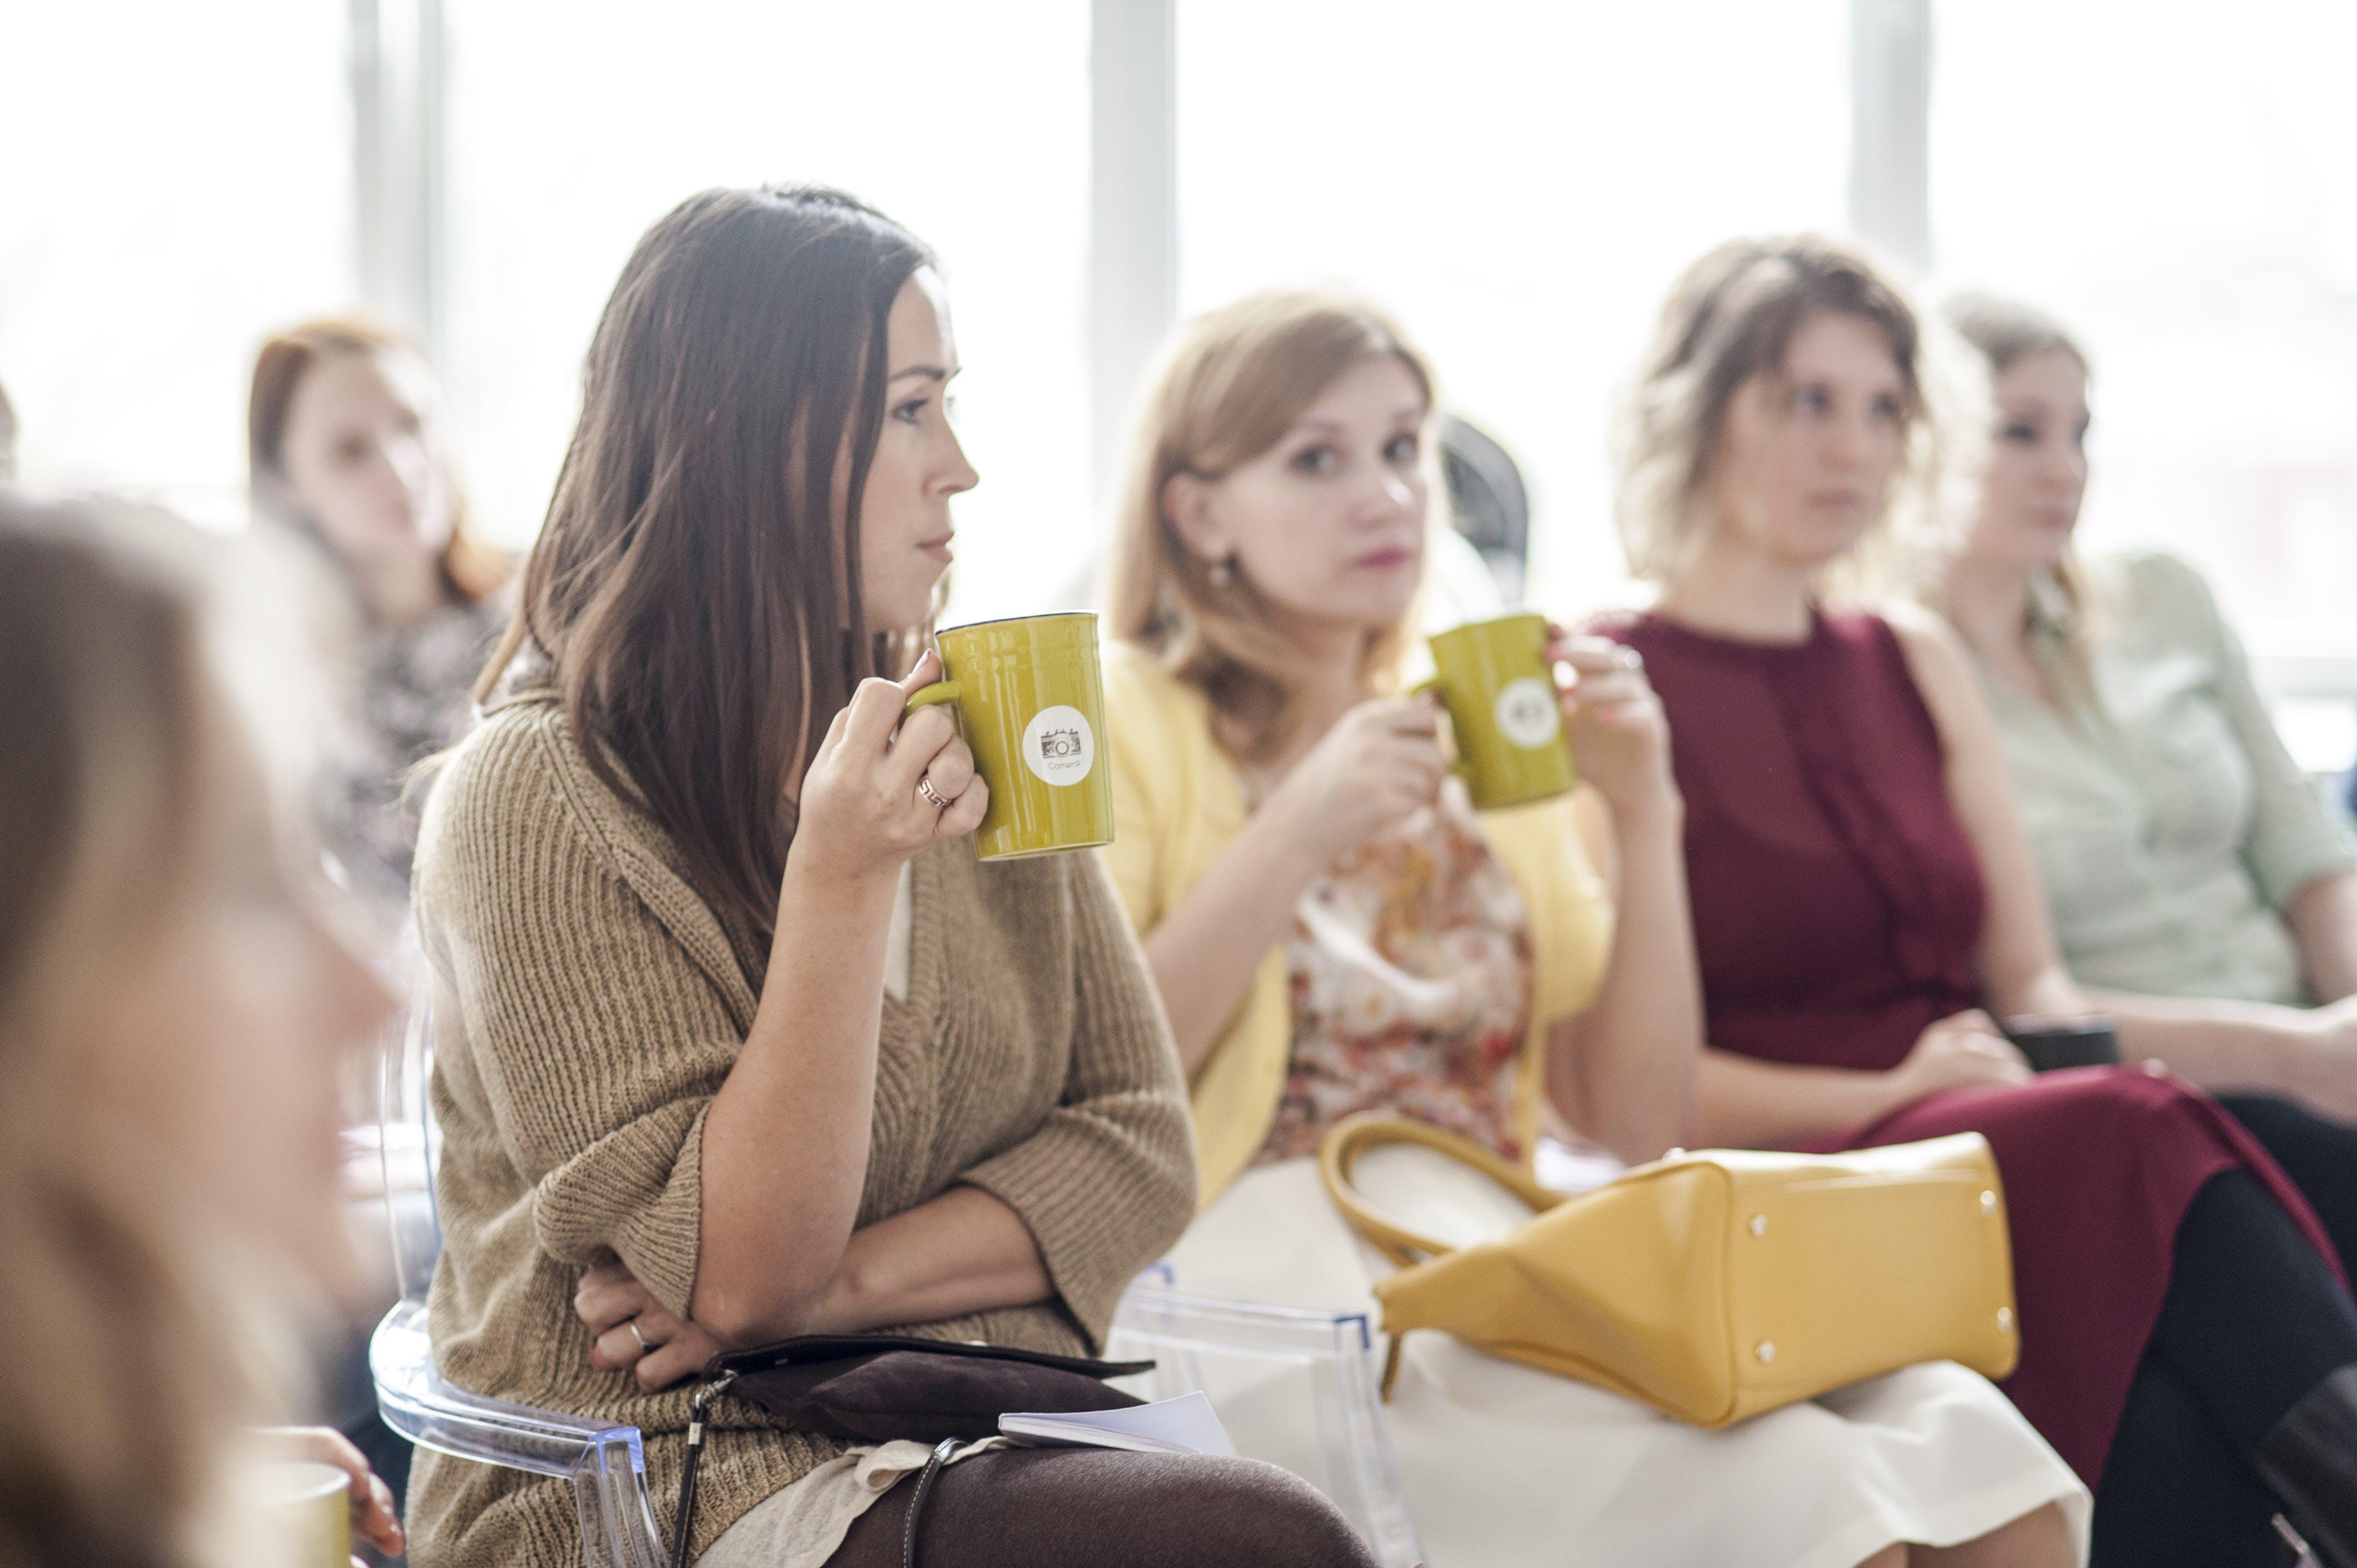 Woman Wearing Brown Corduroy Coat Holding Mug While Sitting on Chair